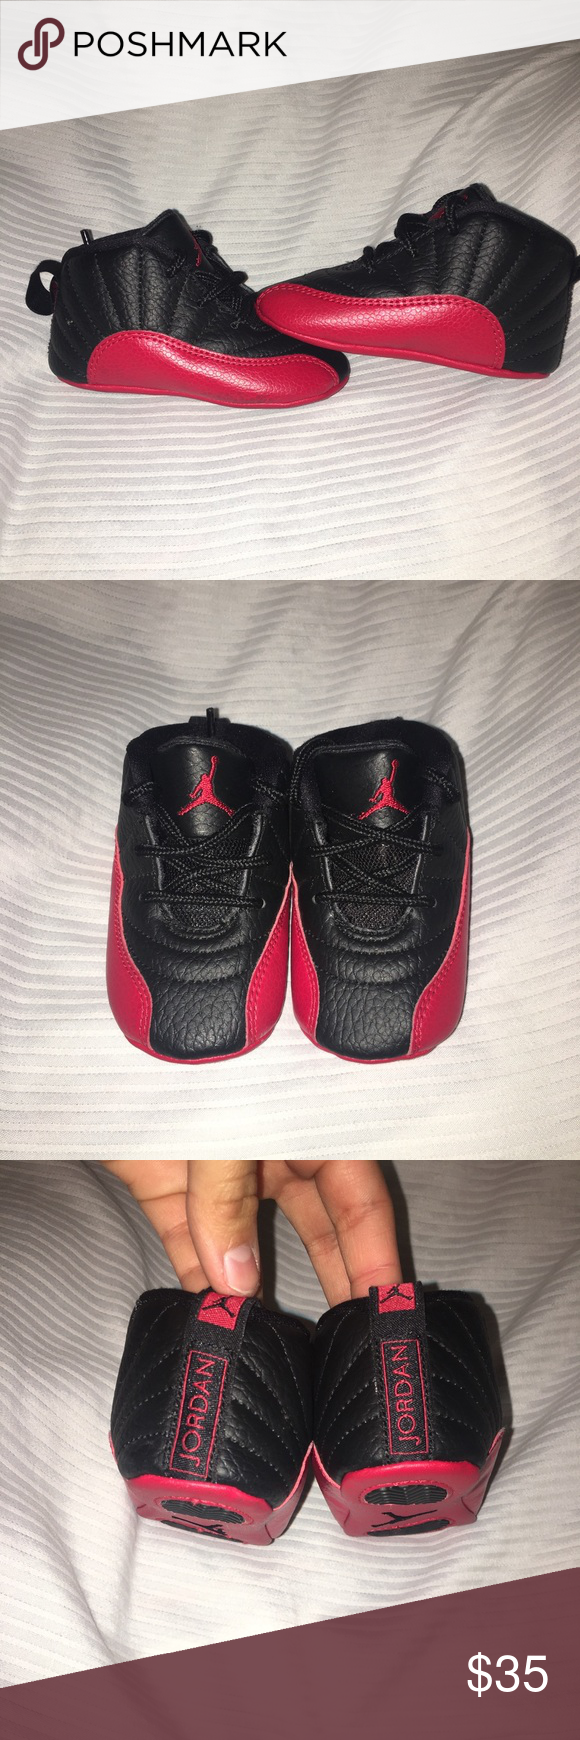 new concept 41371 b4138 Baby Jordan 12s. Size: 3C Red and black Jordan 12s Air ...